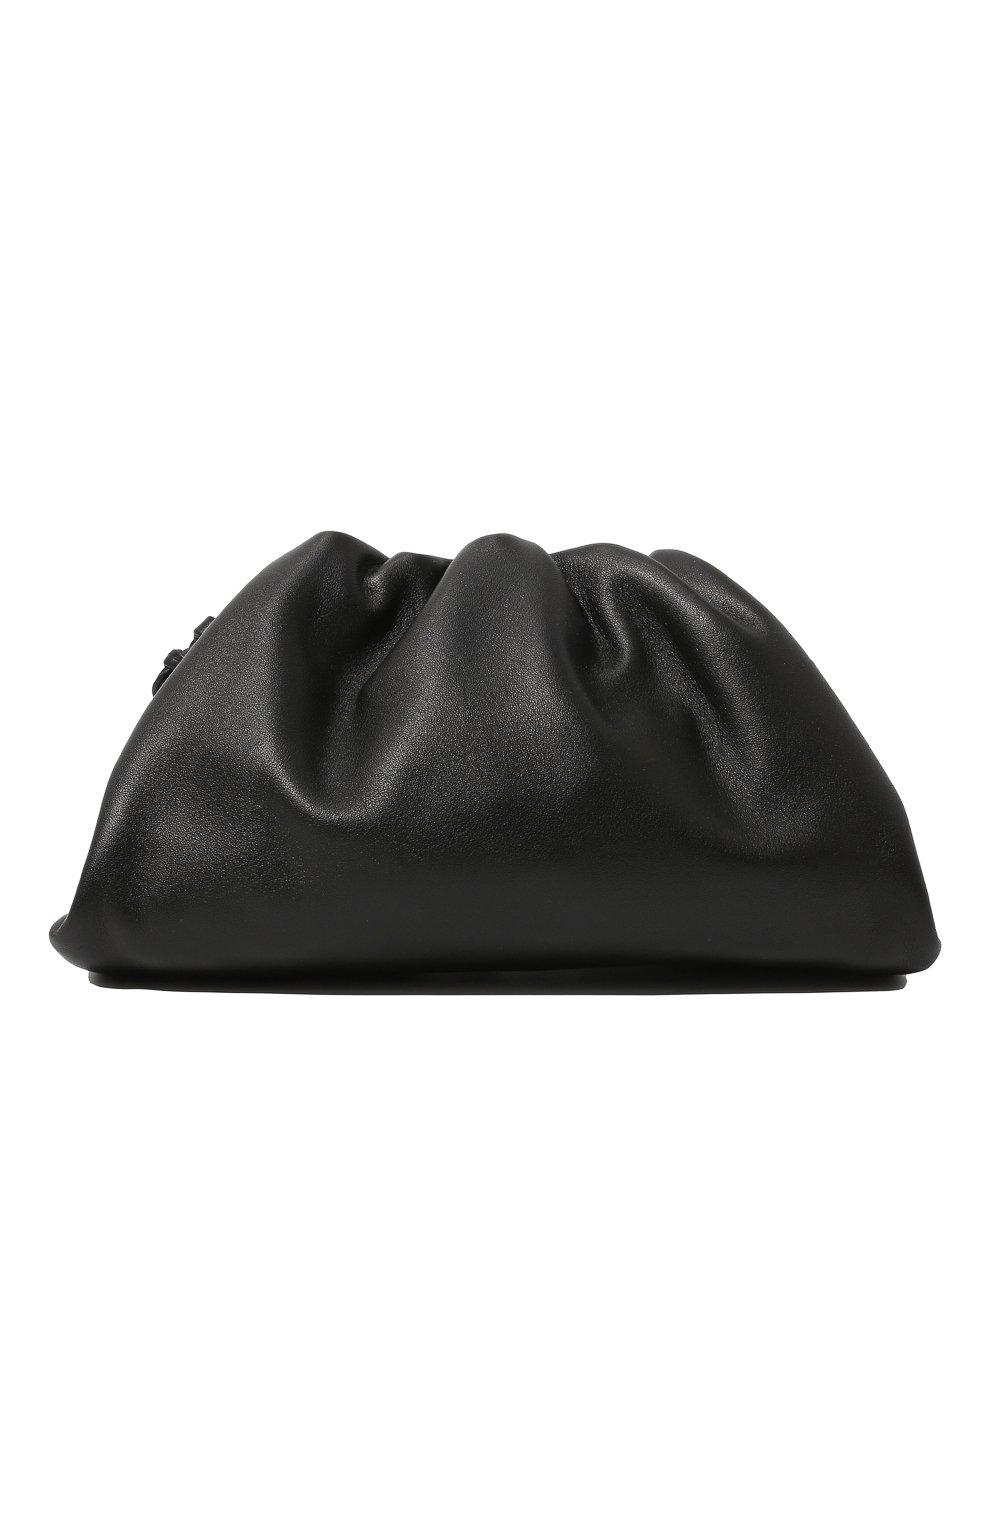 Женский клатч pouch 20 BOTTEGA VENETA черного цвета, арт. 585852/VCP40 | Фото 6